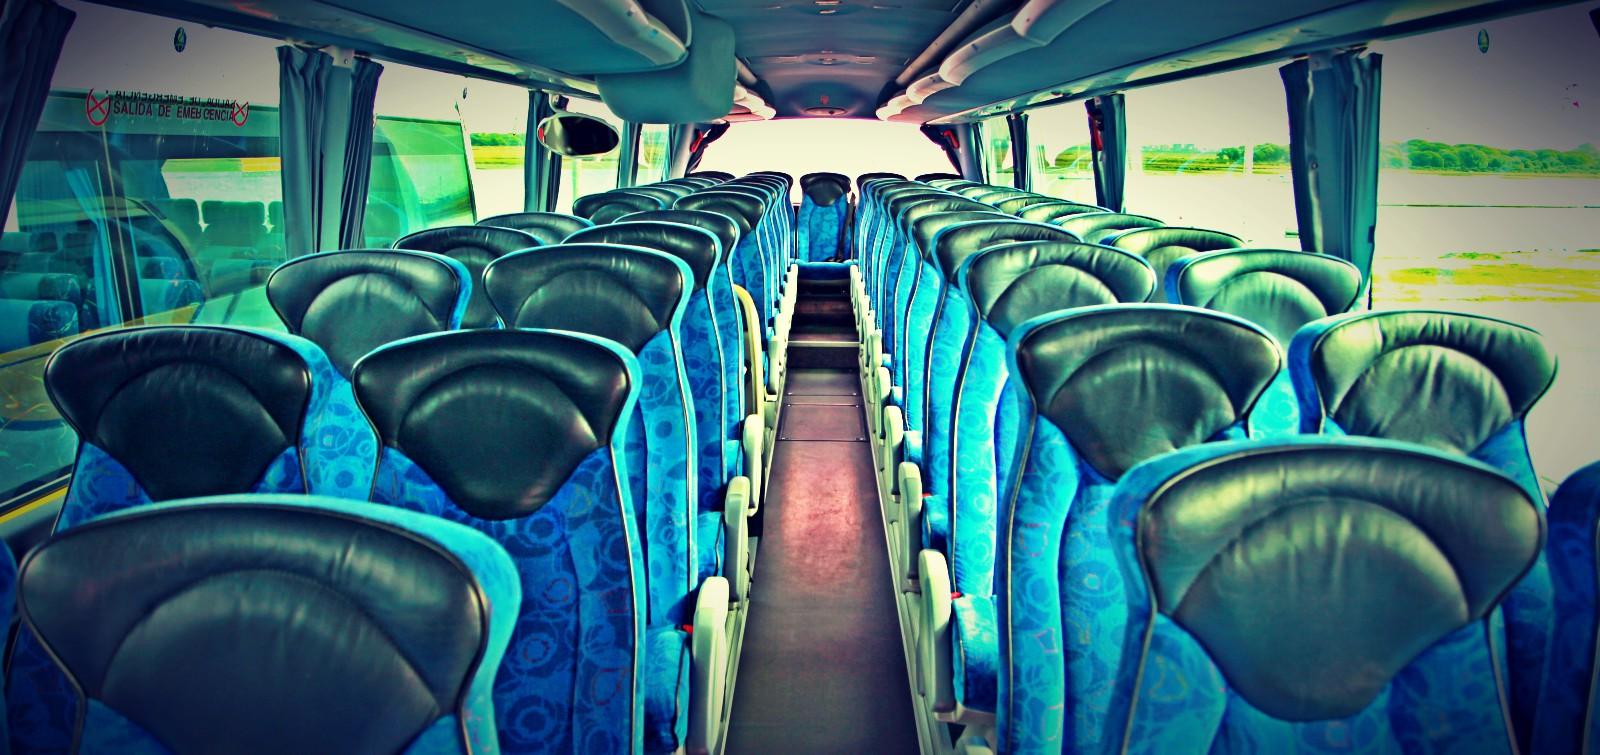 autobuses 24 horas